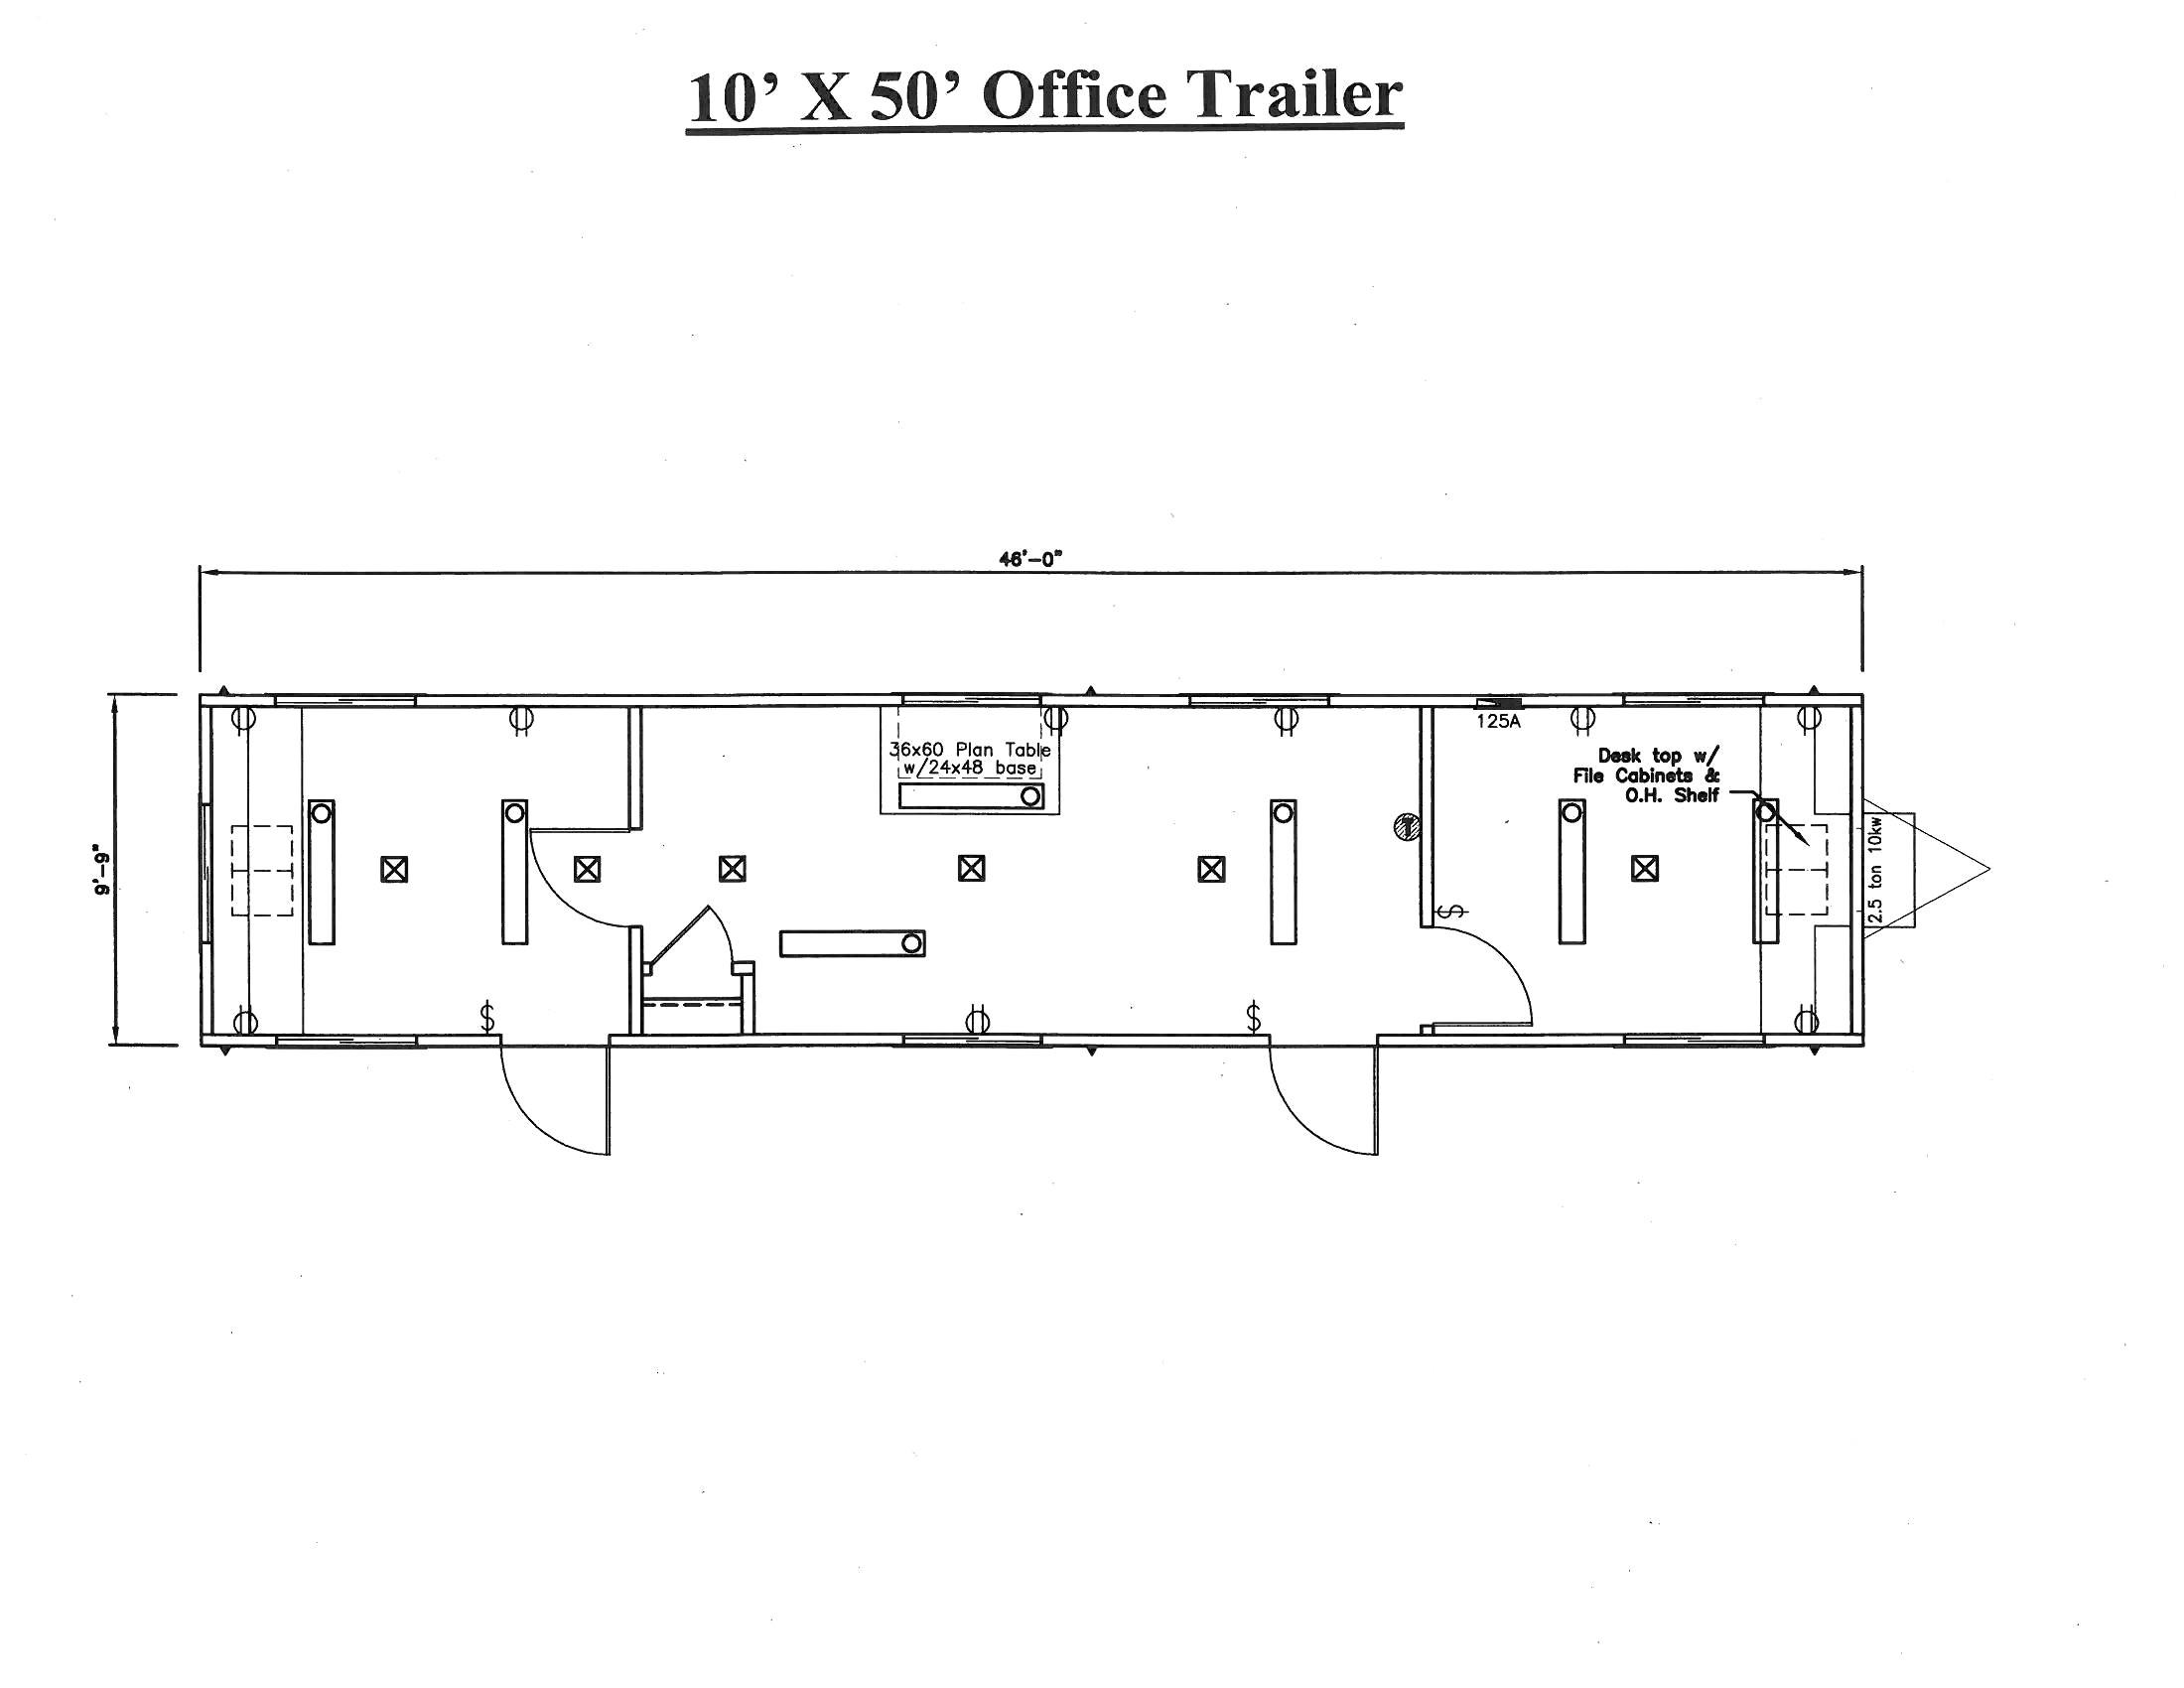 10x50 mobile home floor plan unique marlette mobile homes contemporary 10 50 globaltsp